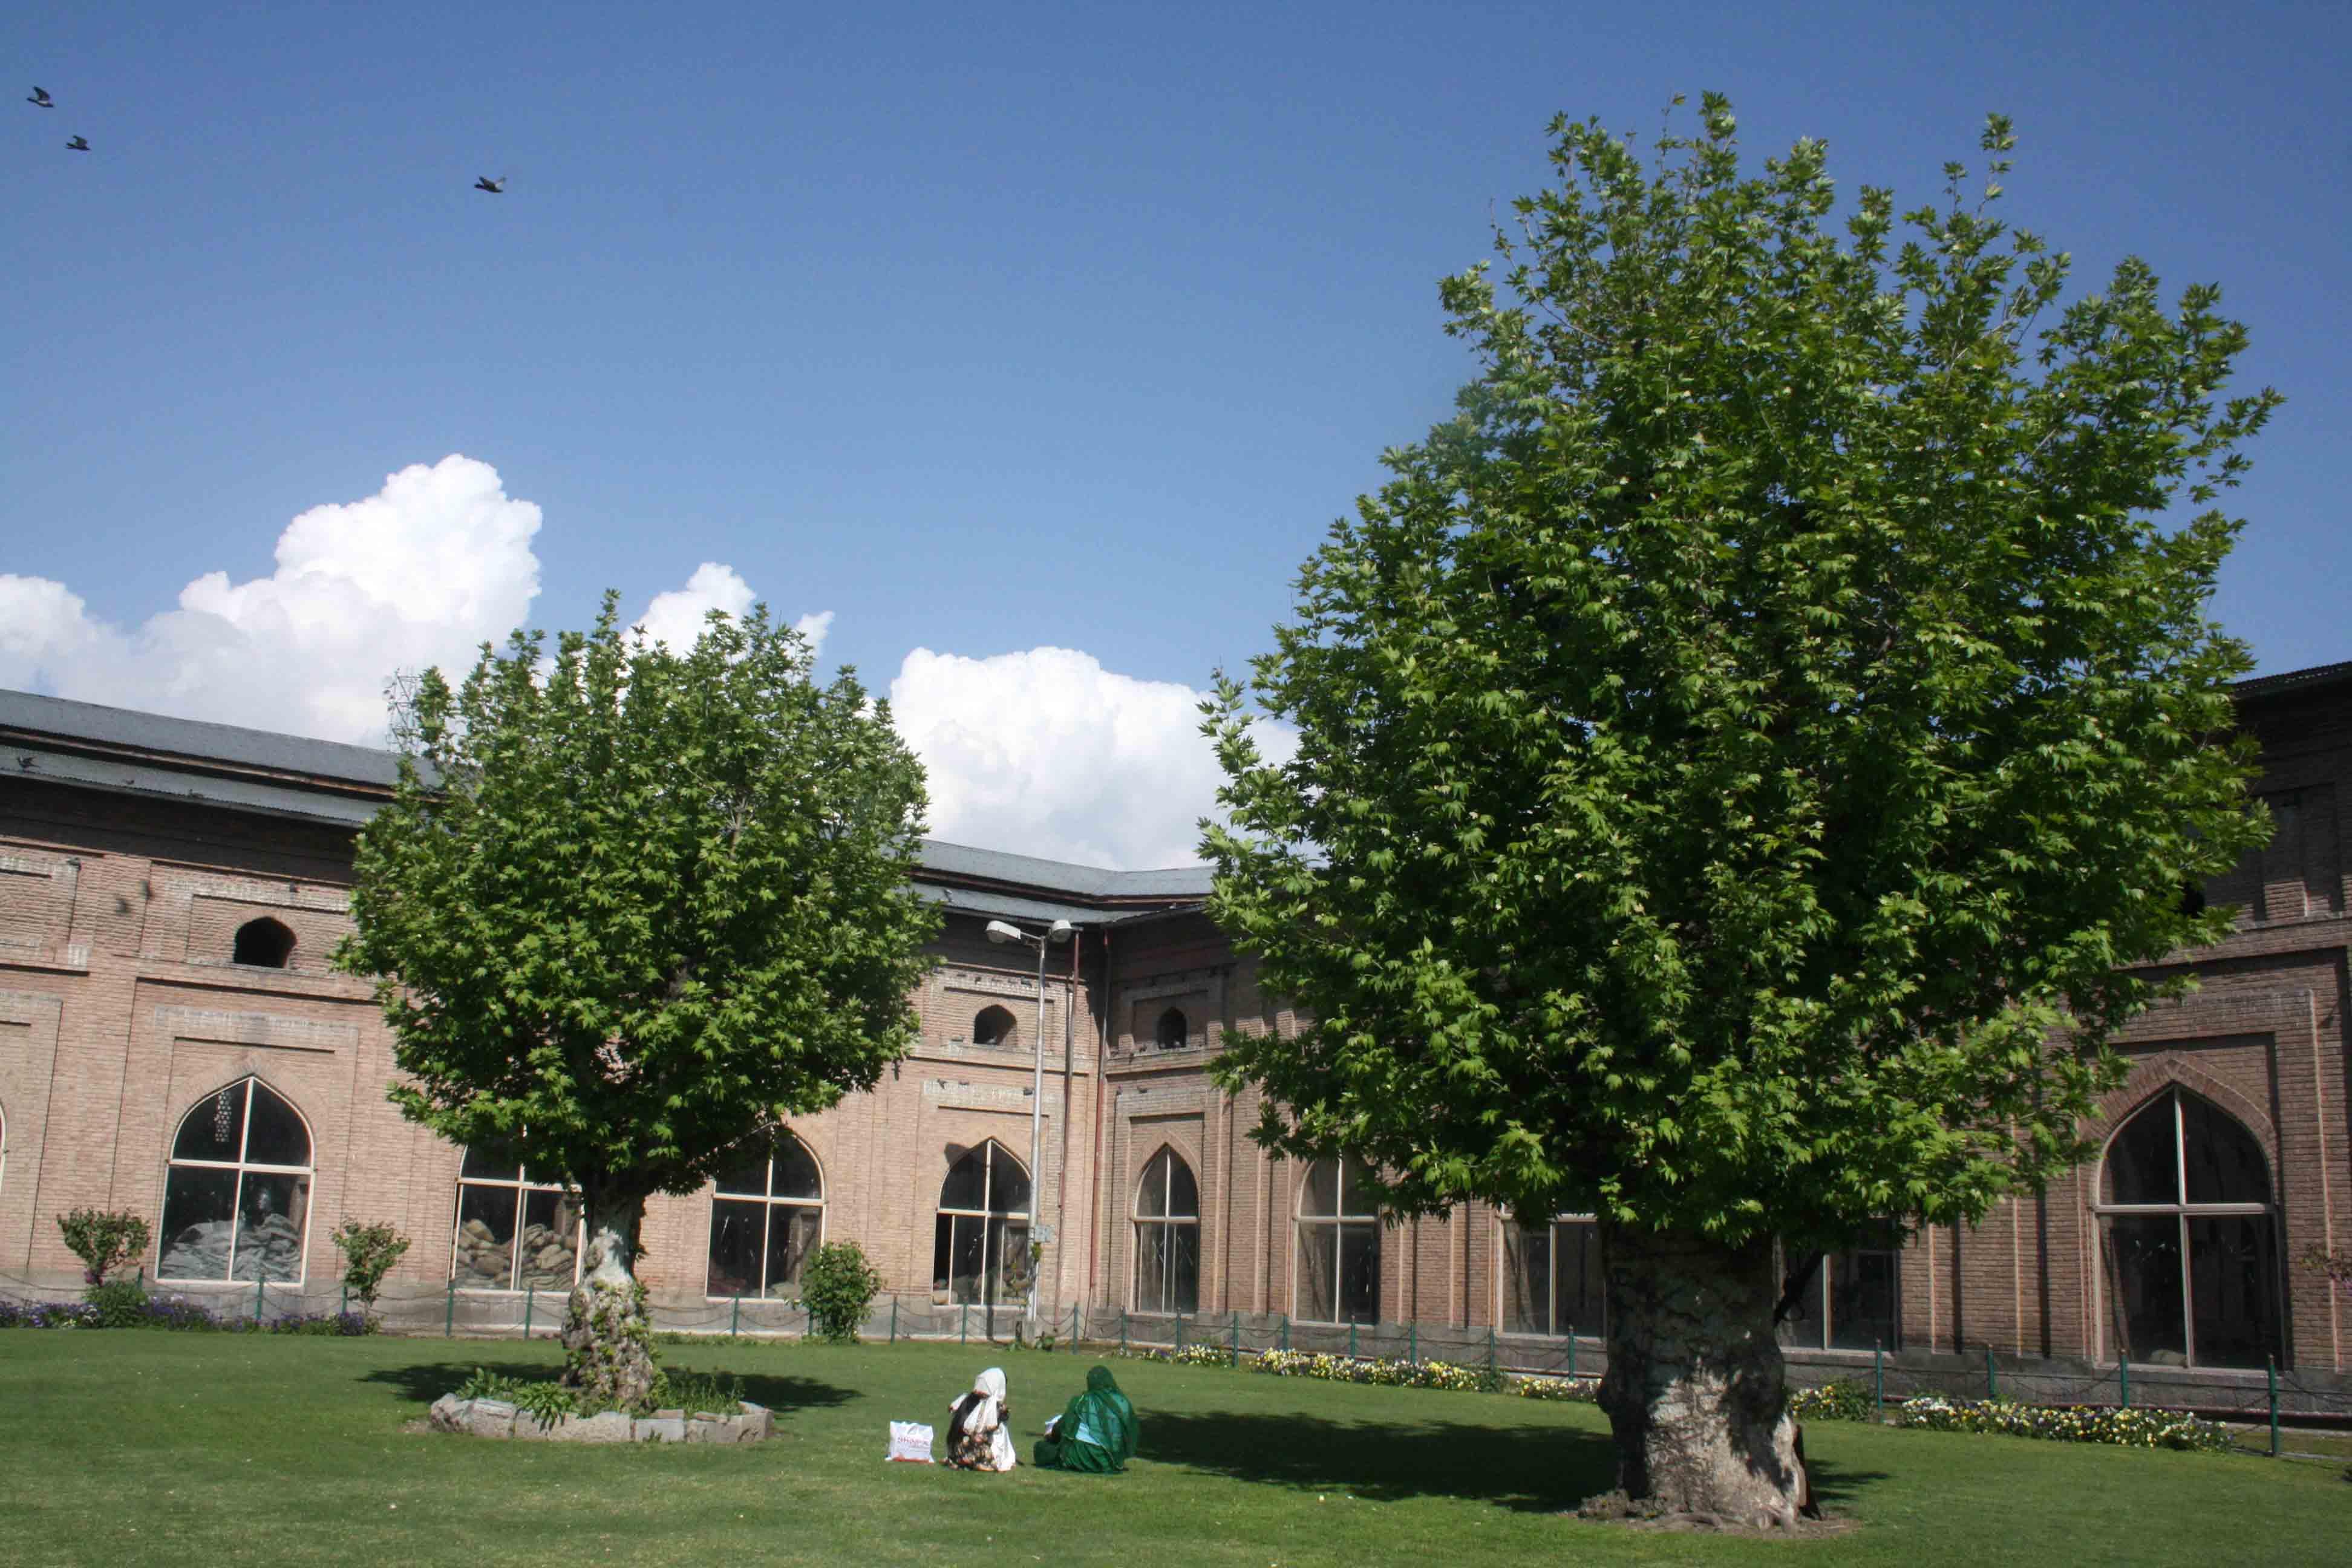 Kashmir Diary - Jamia Masjid, Srinagar